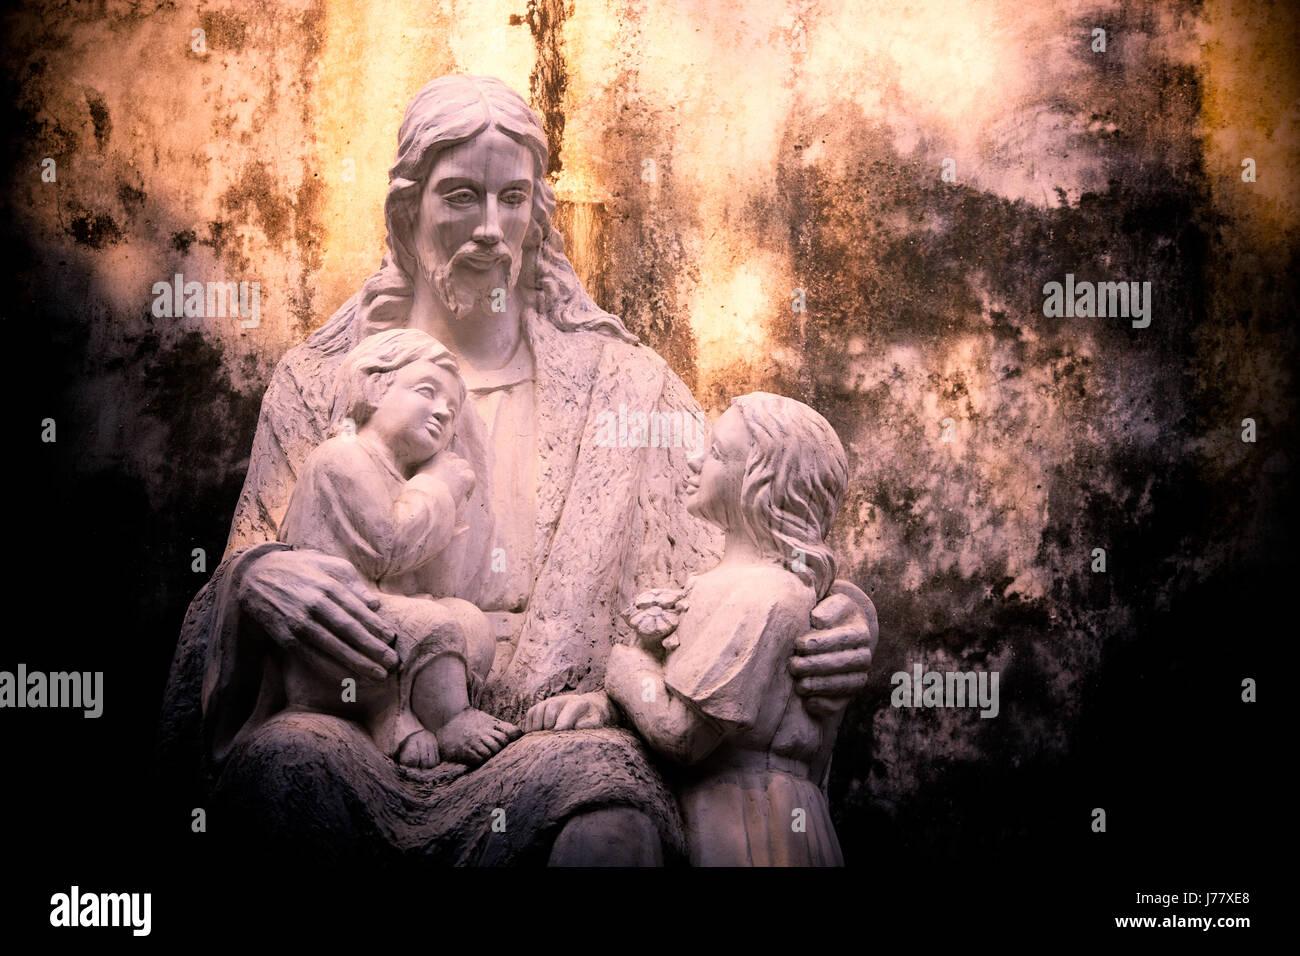 Stone Sculpture Jesus Christ Stock Photos & Stone Sculpture Jesus ...